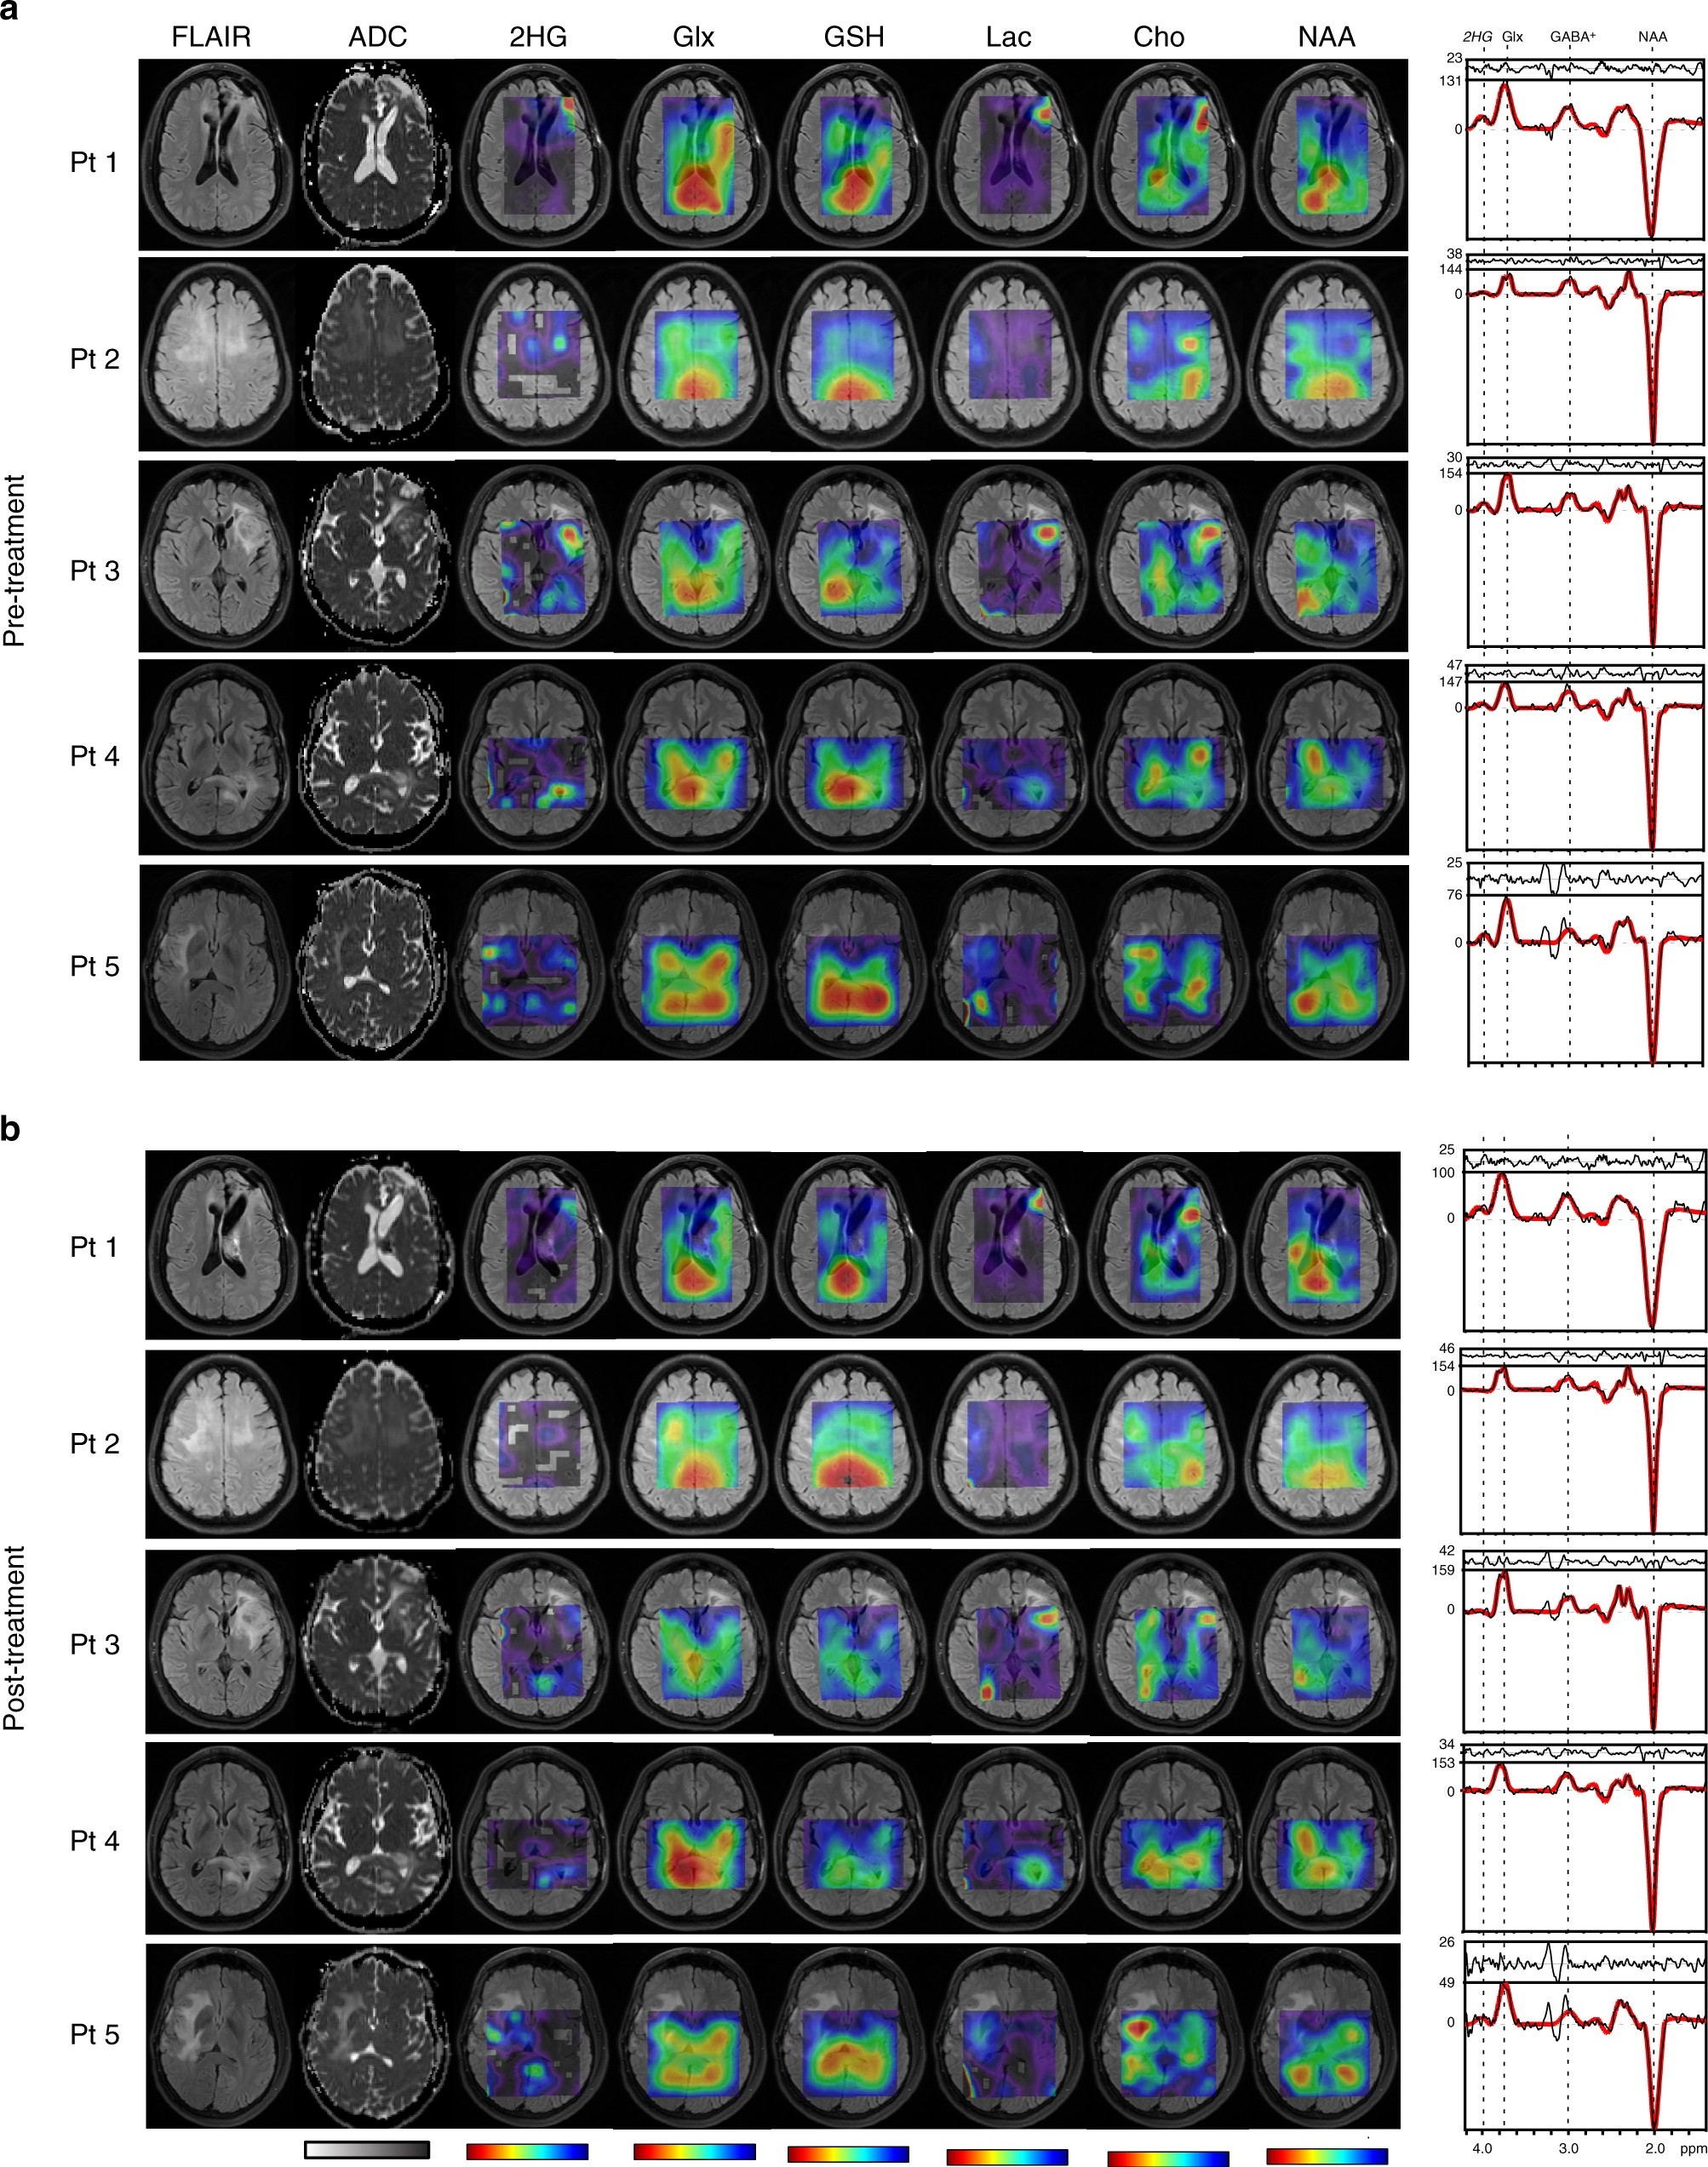 pharmacodynamics of mutant idh1 inhibitors in glioma patients